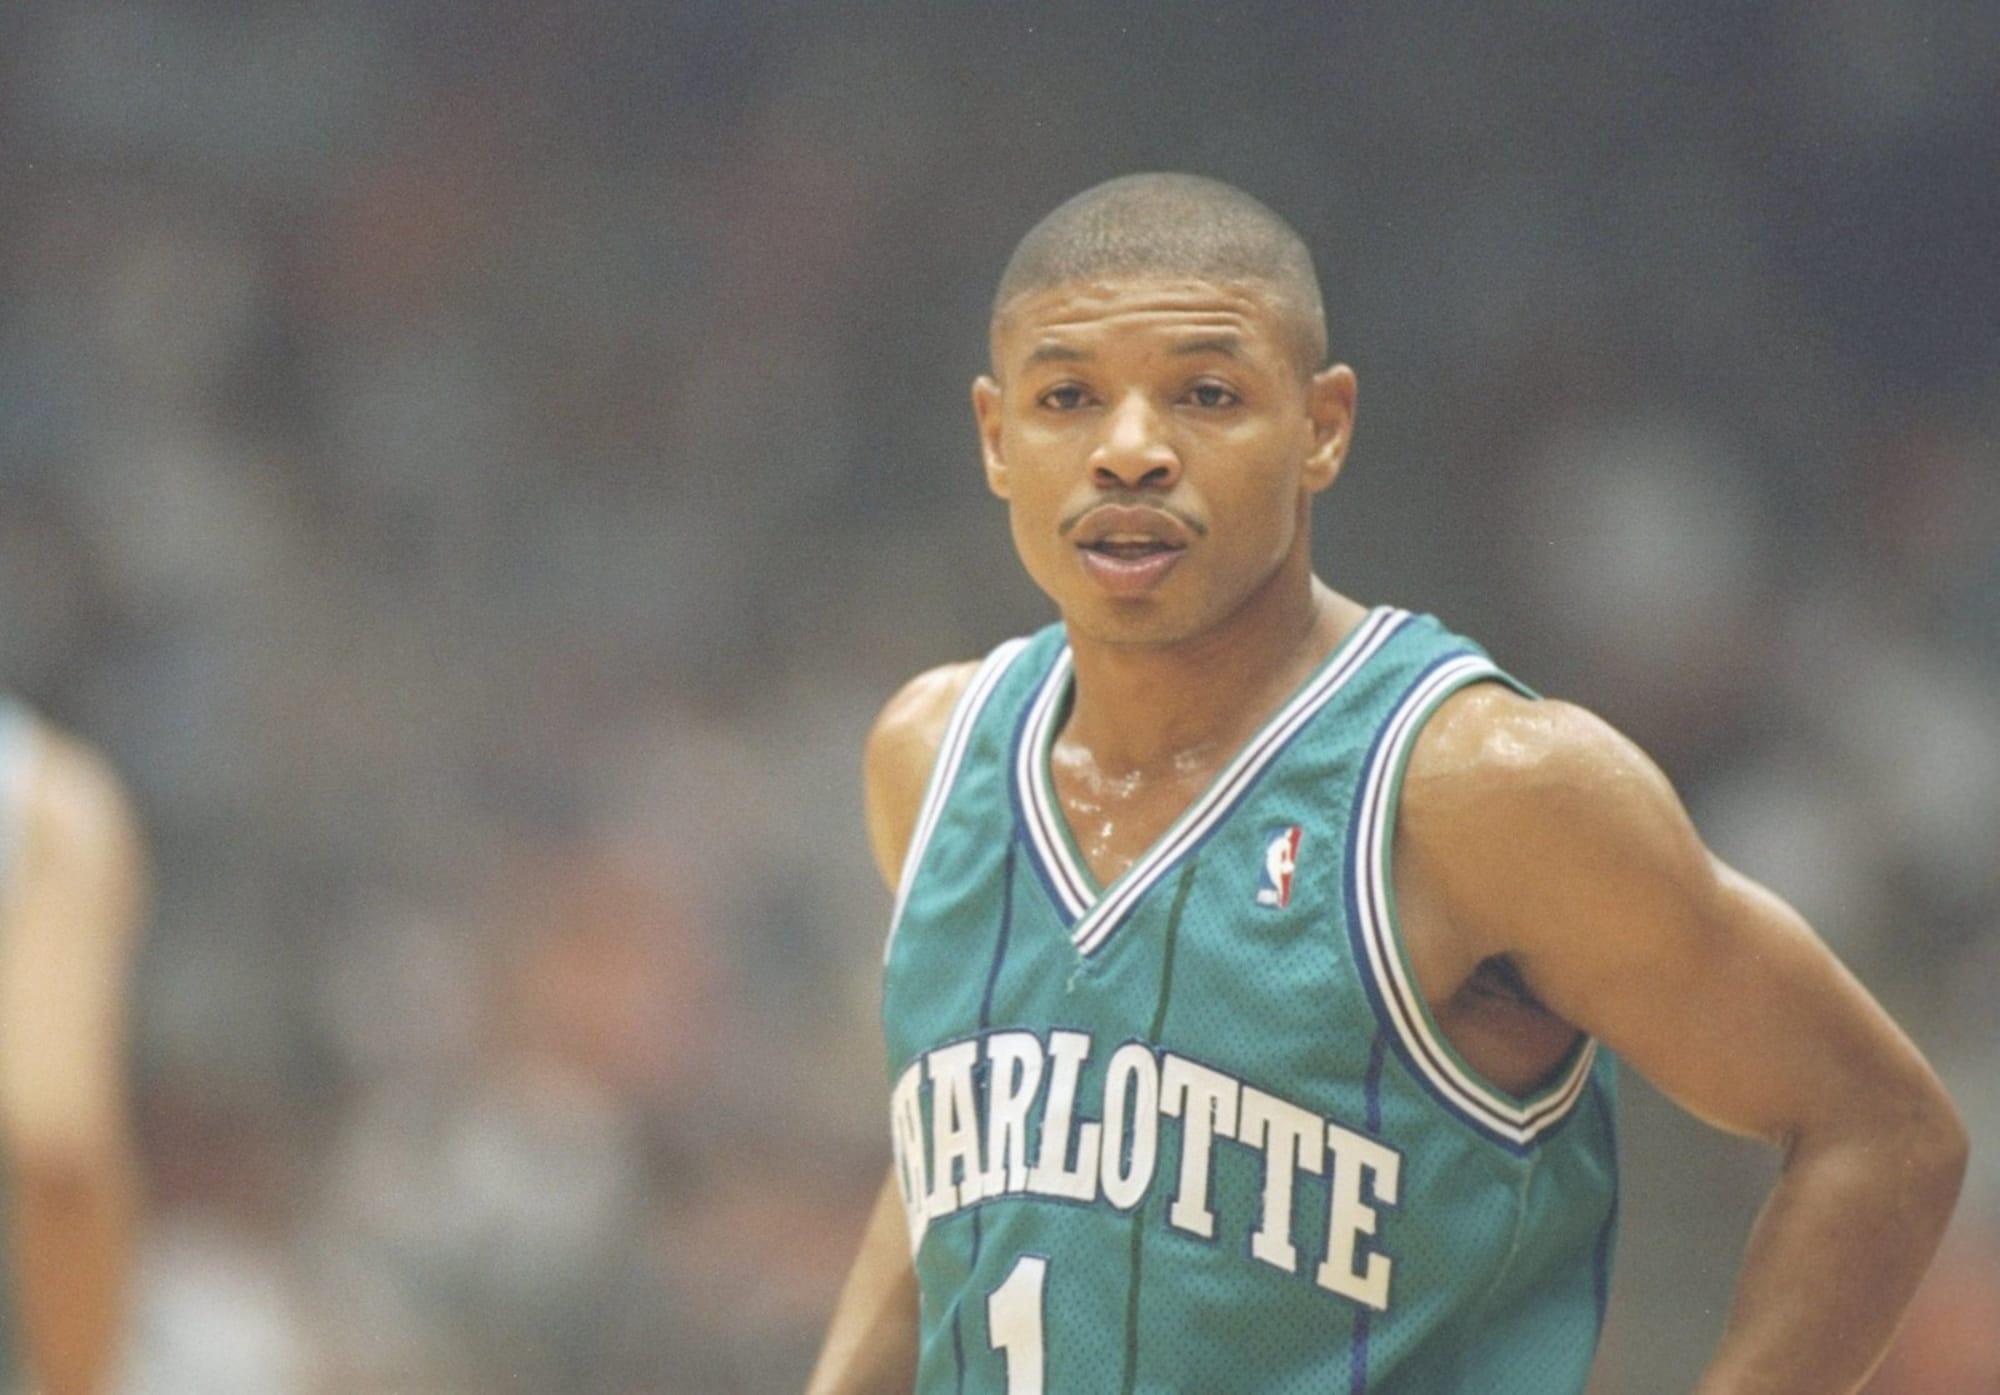 Charlotte Hornets: Team history and mascot origins